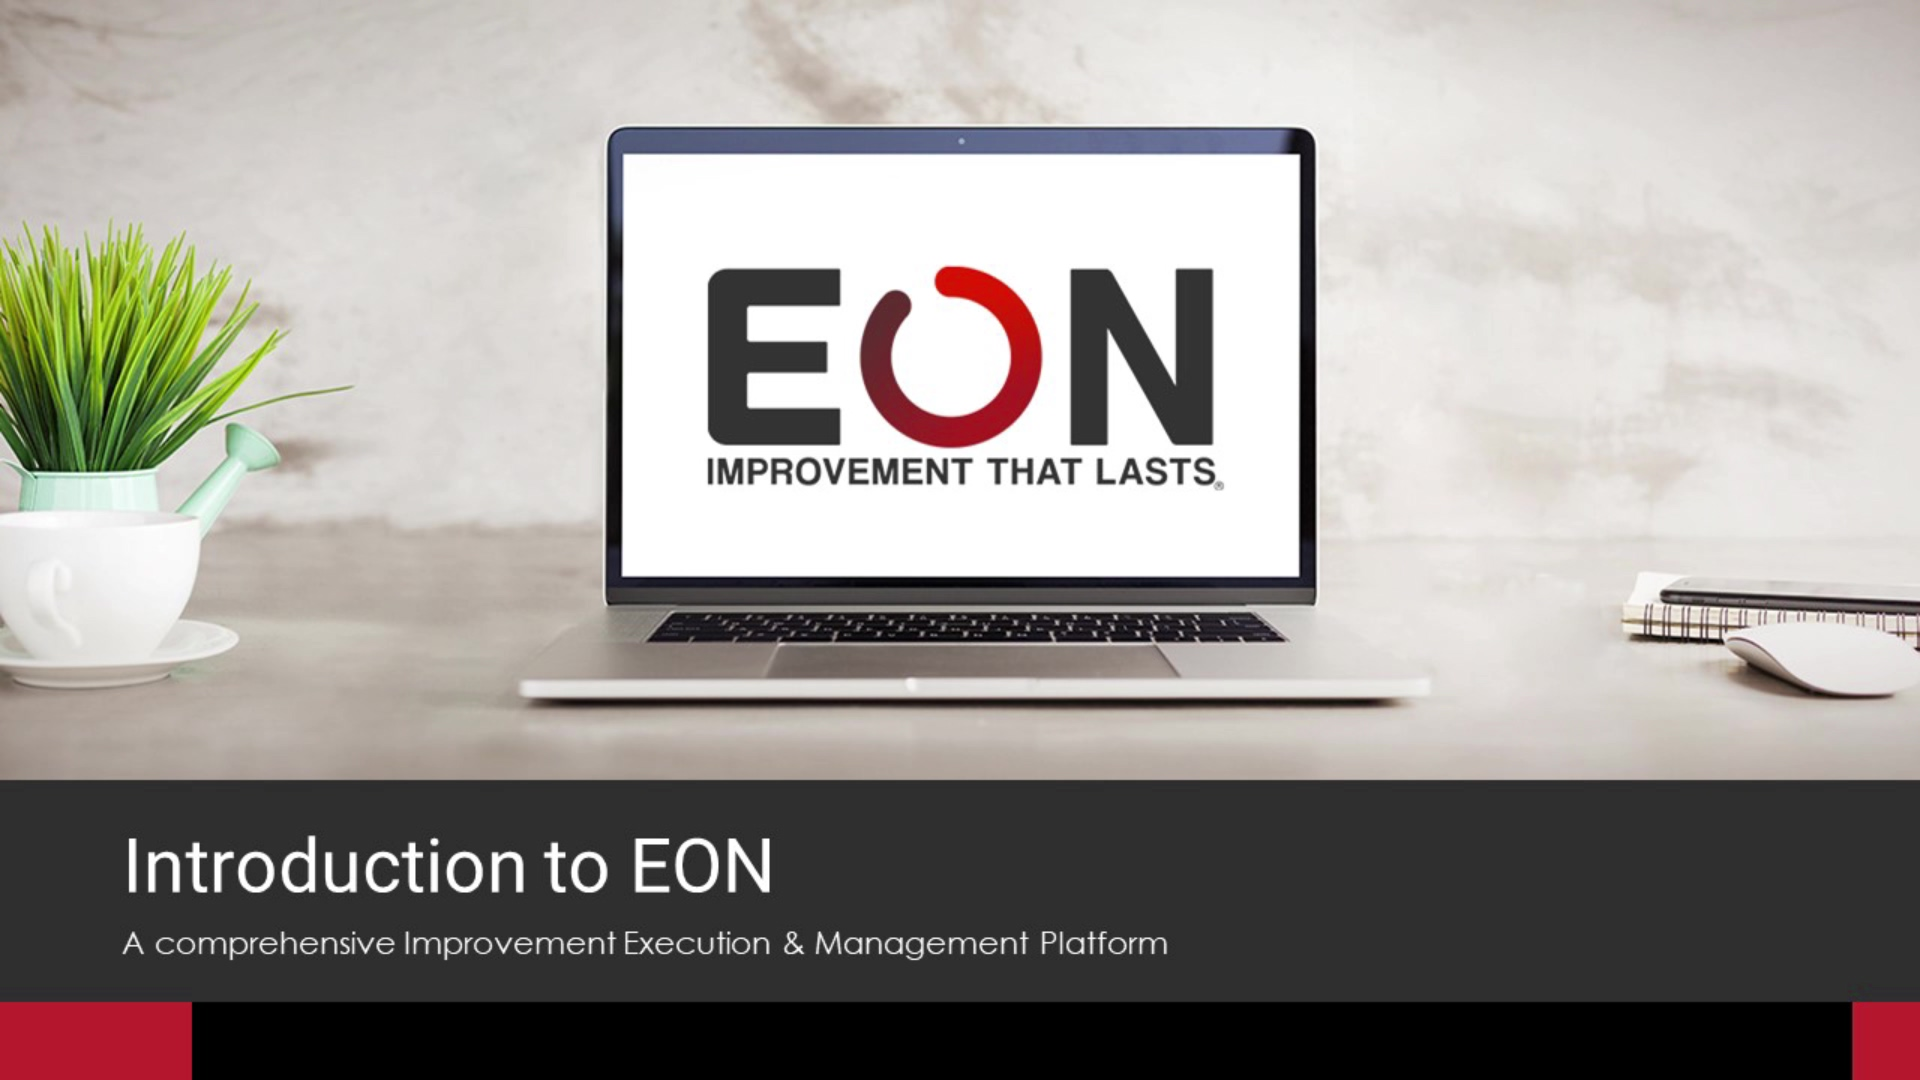 EON Demo Overview